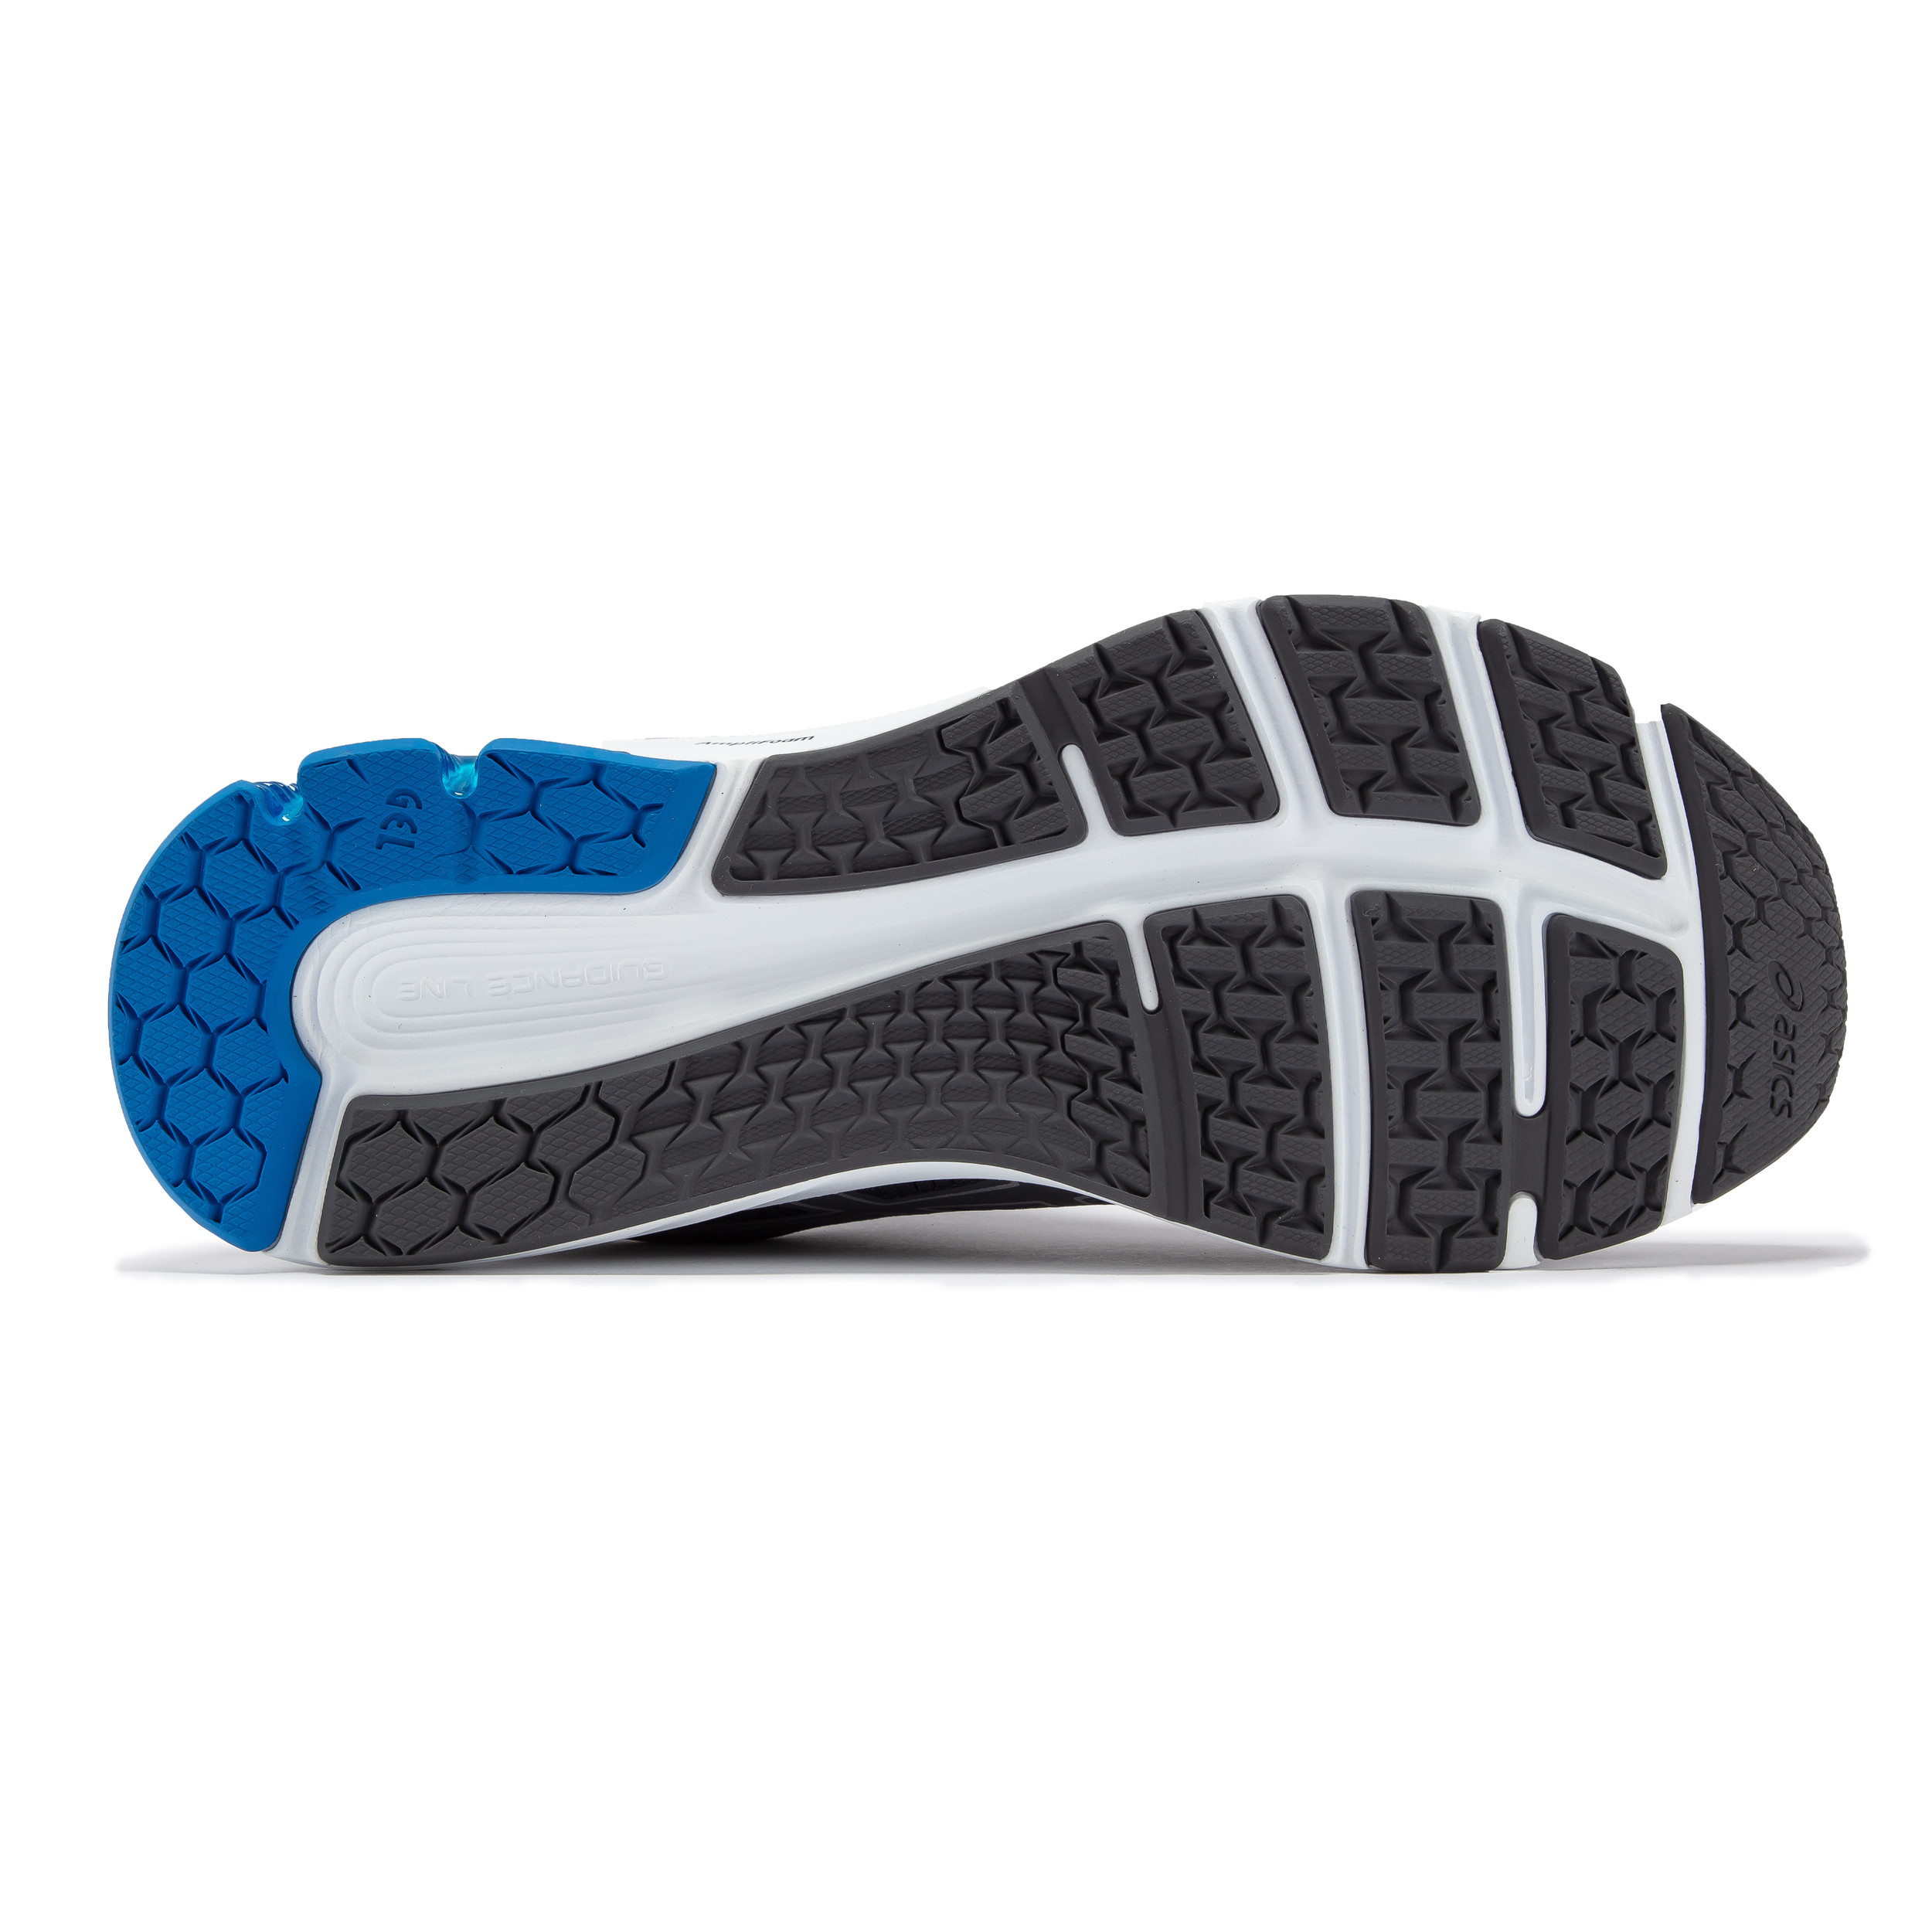 miniature 3 - Asics-Homme-Gel-Pulse-12-Chaussures-De-Course-Baskets-Sneakers-Bleu-Marine-Sports